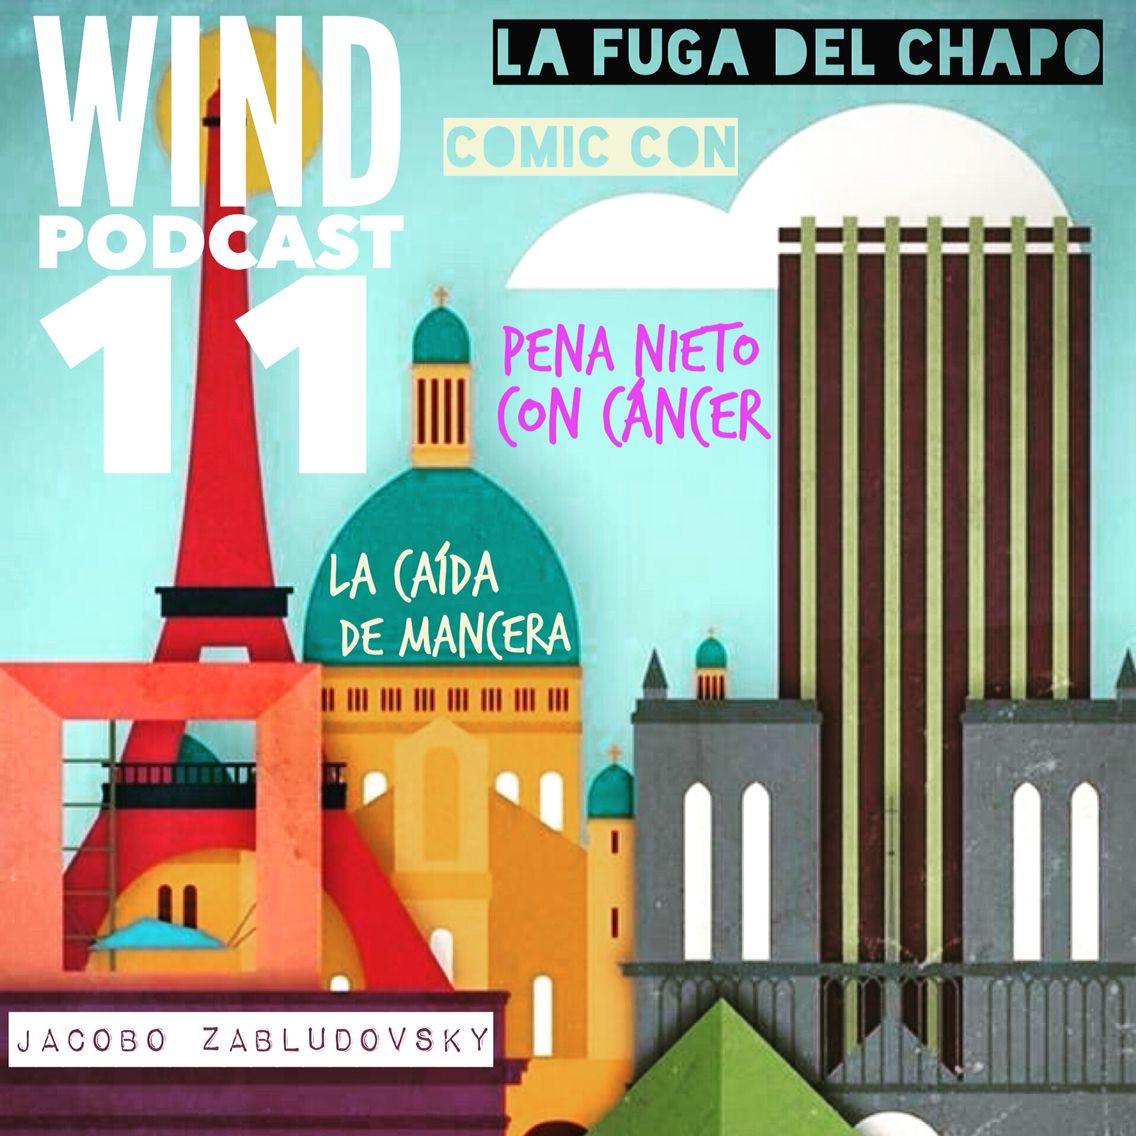 Wind Podcast 10: la  #FugaDelChapo, la Comic-Con #SDCC, Peña Nieto con cáncer, la caída de Mancera y Jacobo Zabludovsky.  https://t.co/JAYPusnivb